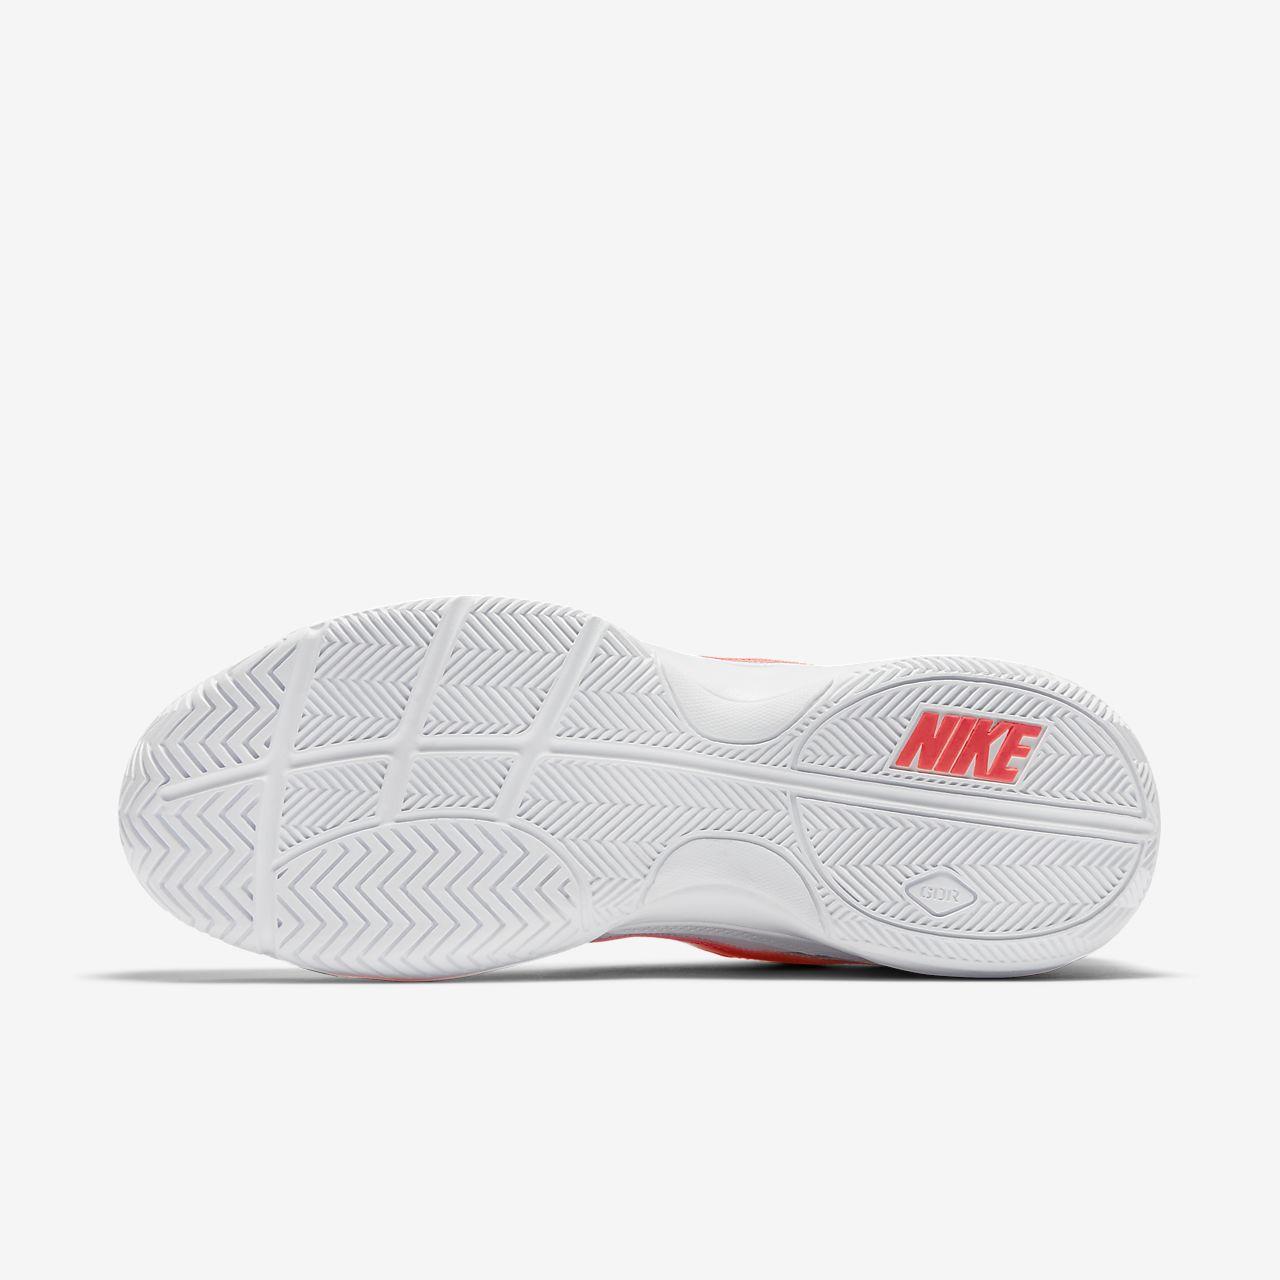 156da27204a3f NikeCourt Lite Zapatillas de tenis de pista rápida - Hombre. Nike.com ES